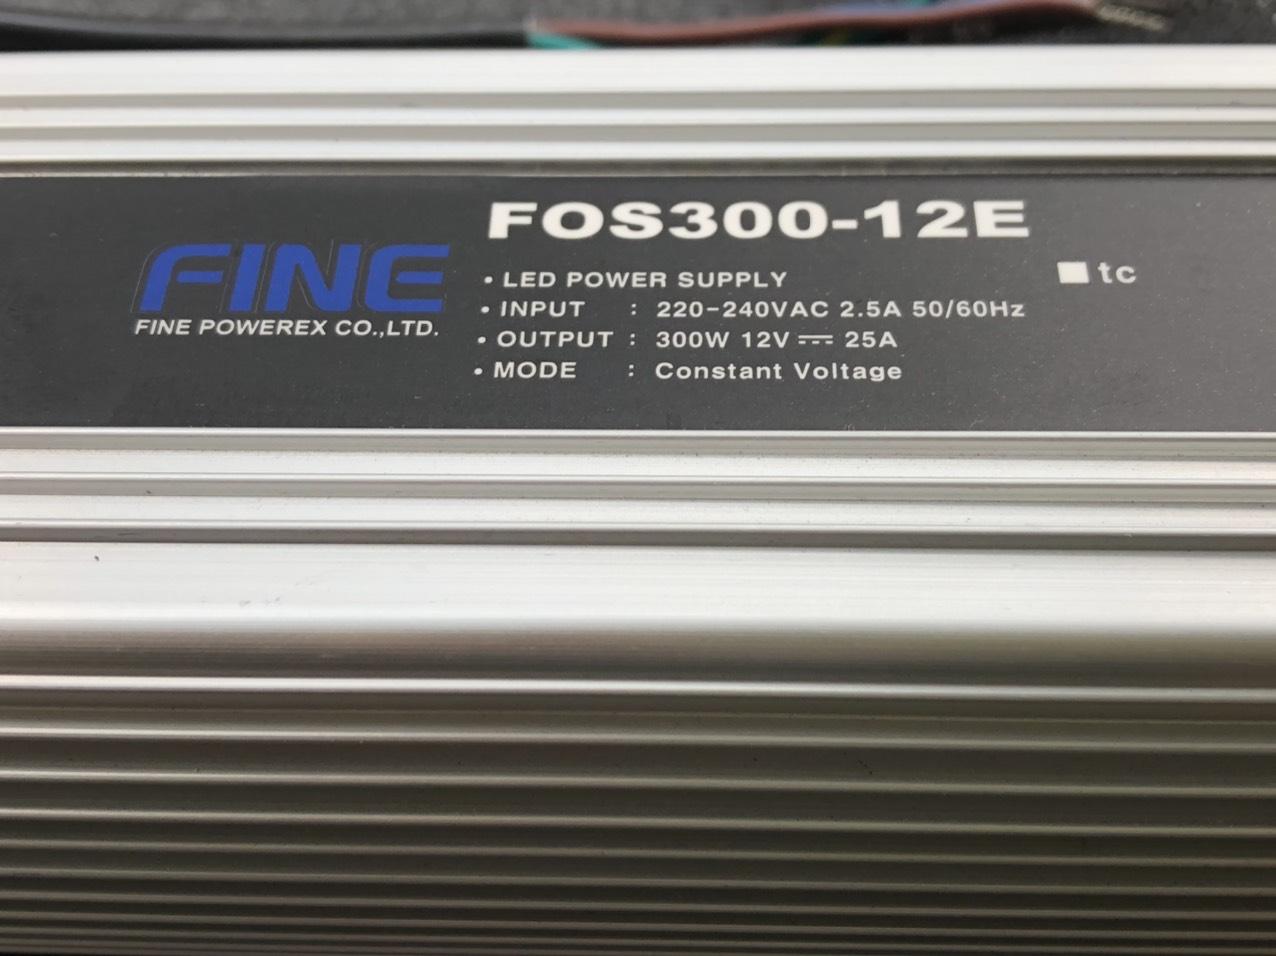 NGUỒN HÀN QUỐC IP68 12V 300W FOS300-12E